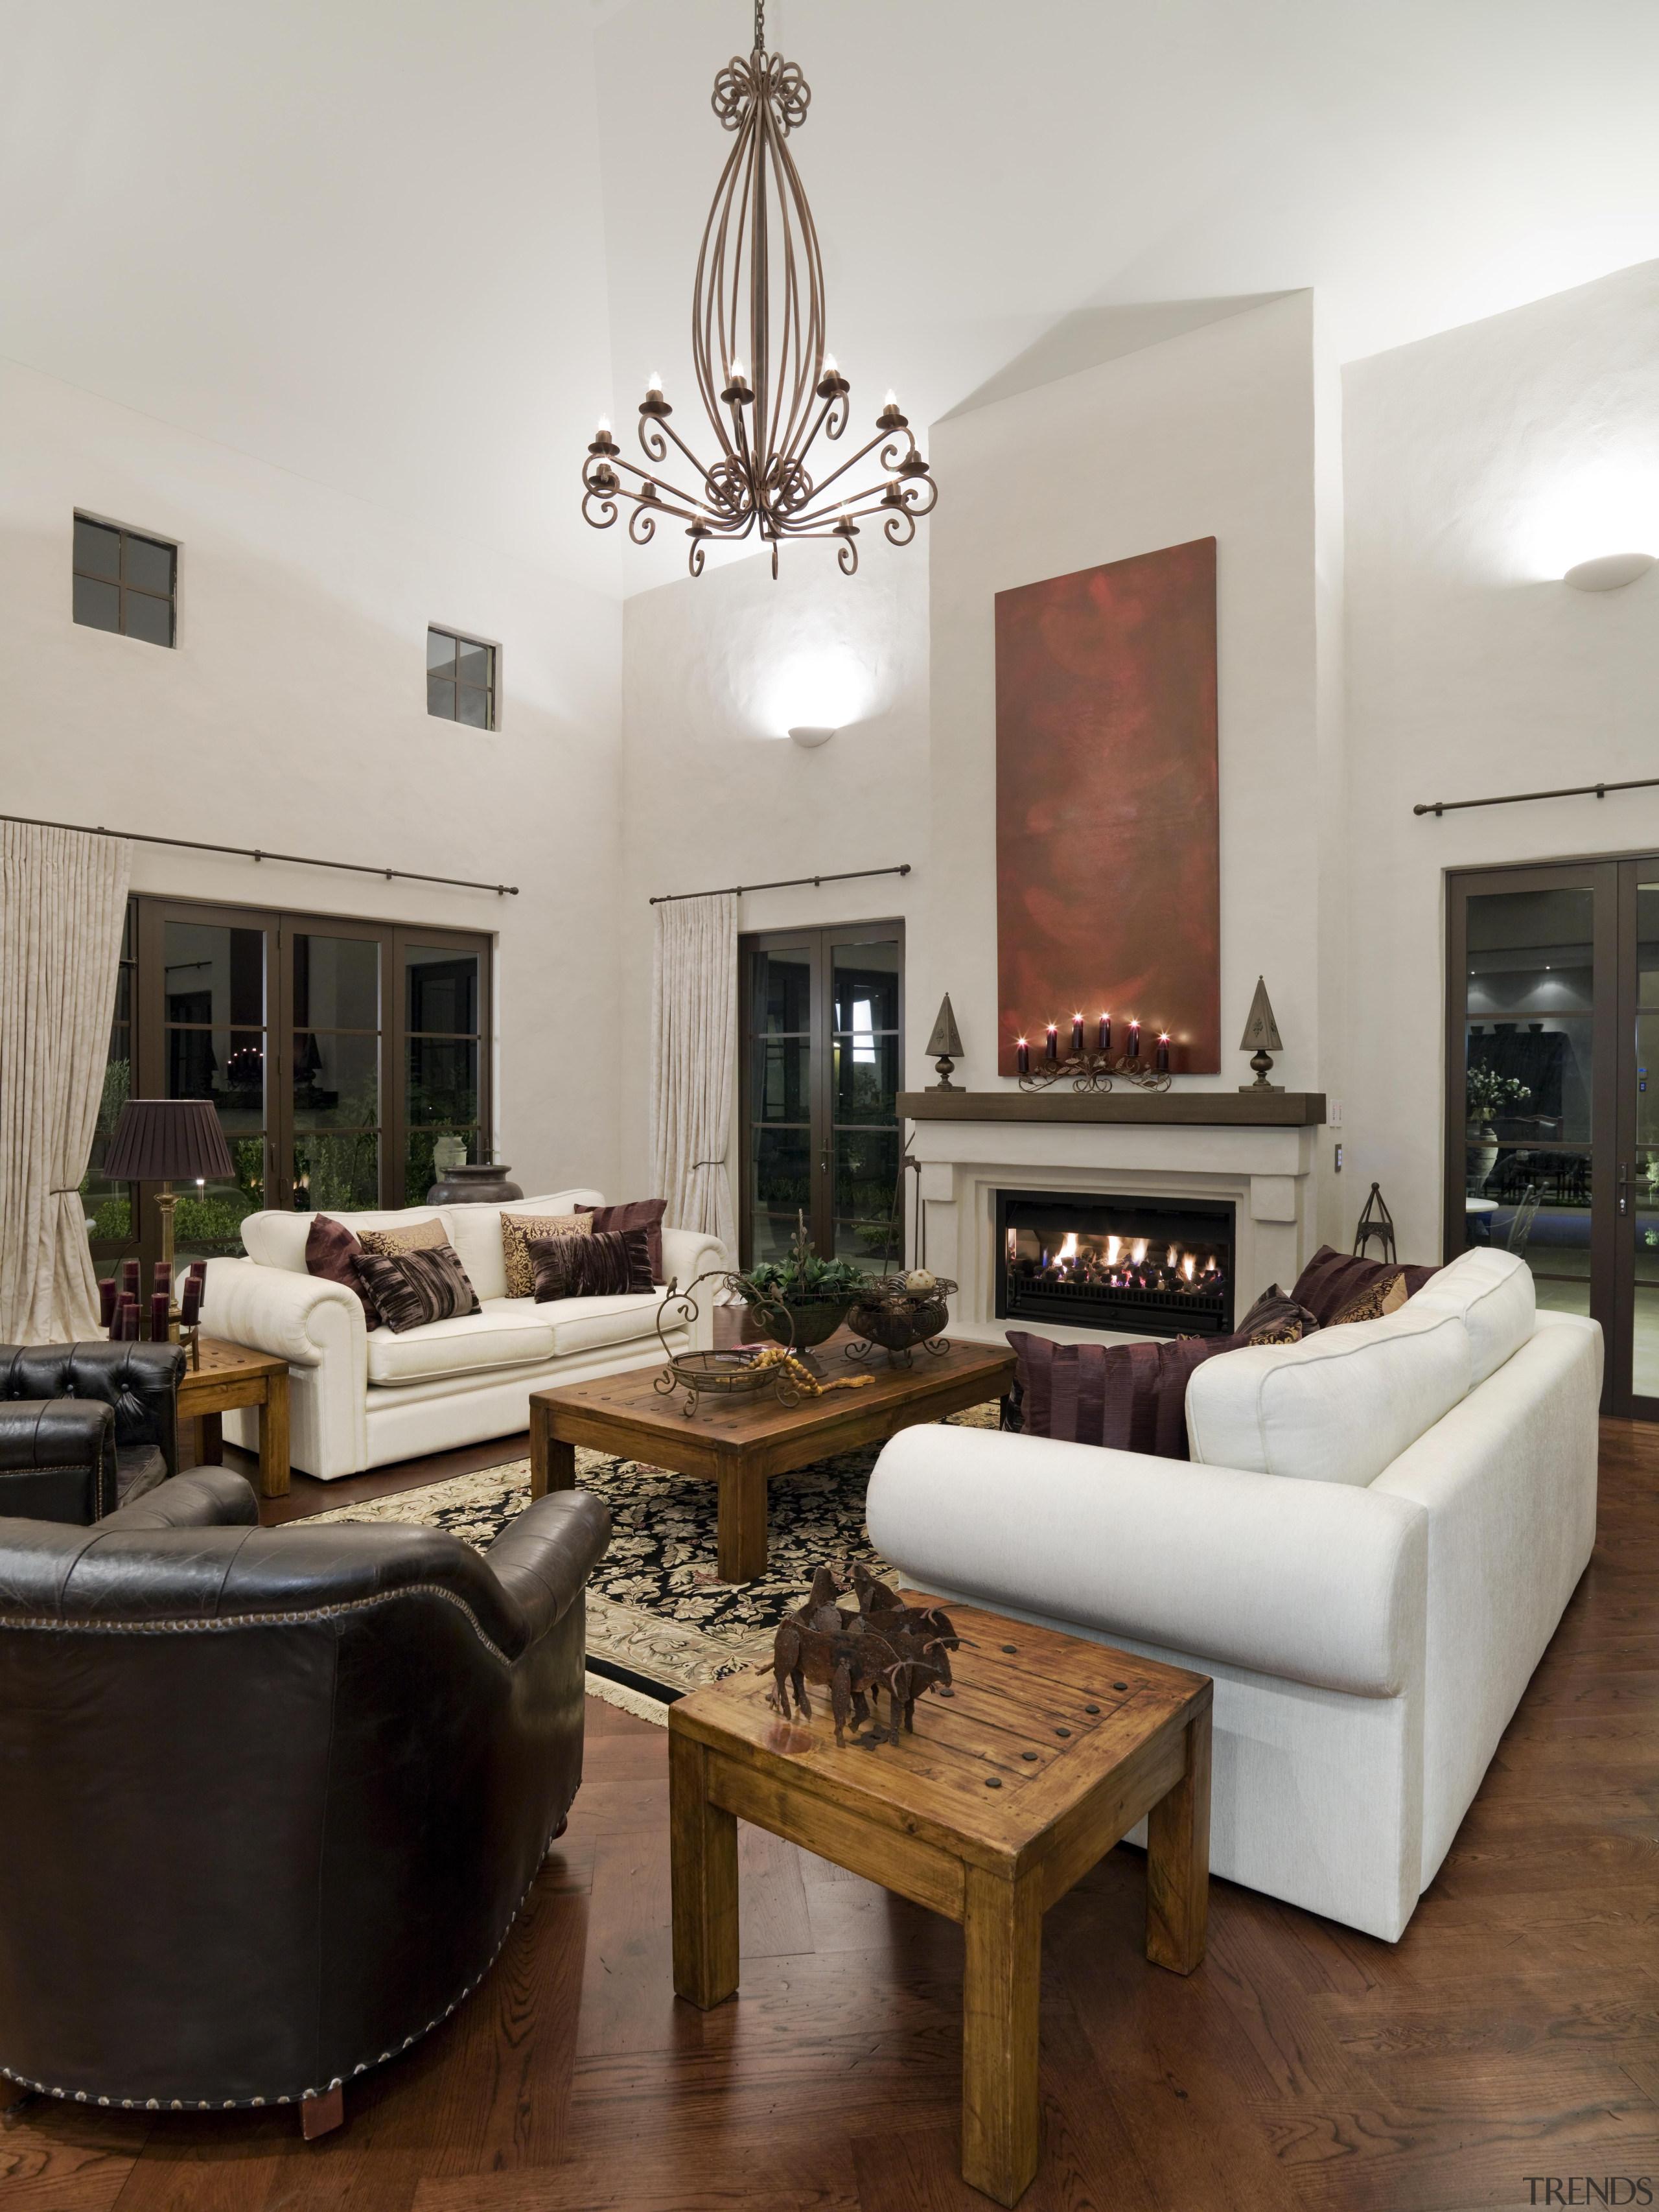 109goodlands 29 - Goodlands_29 - ceiling | coffee ceiling, coffee table, floor, flooring, furniture, hardwood, home, interior design, living room, room, table, gray